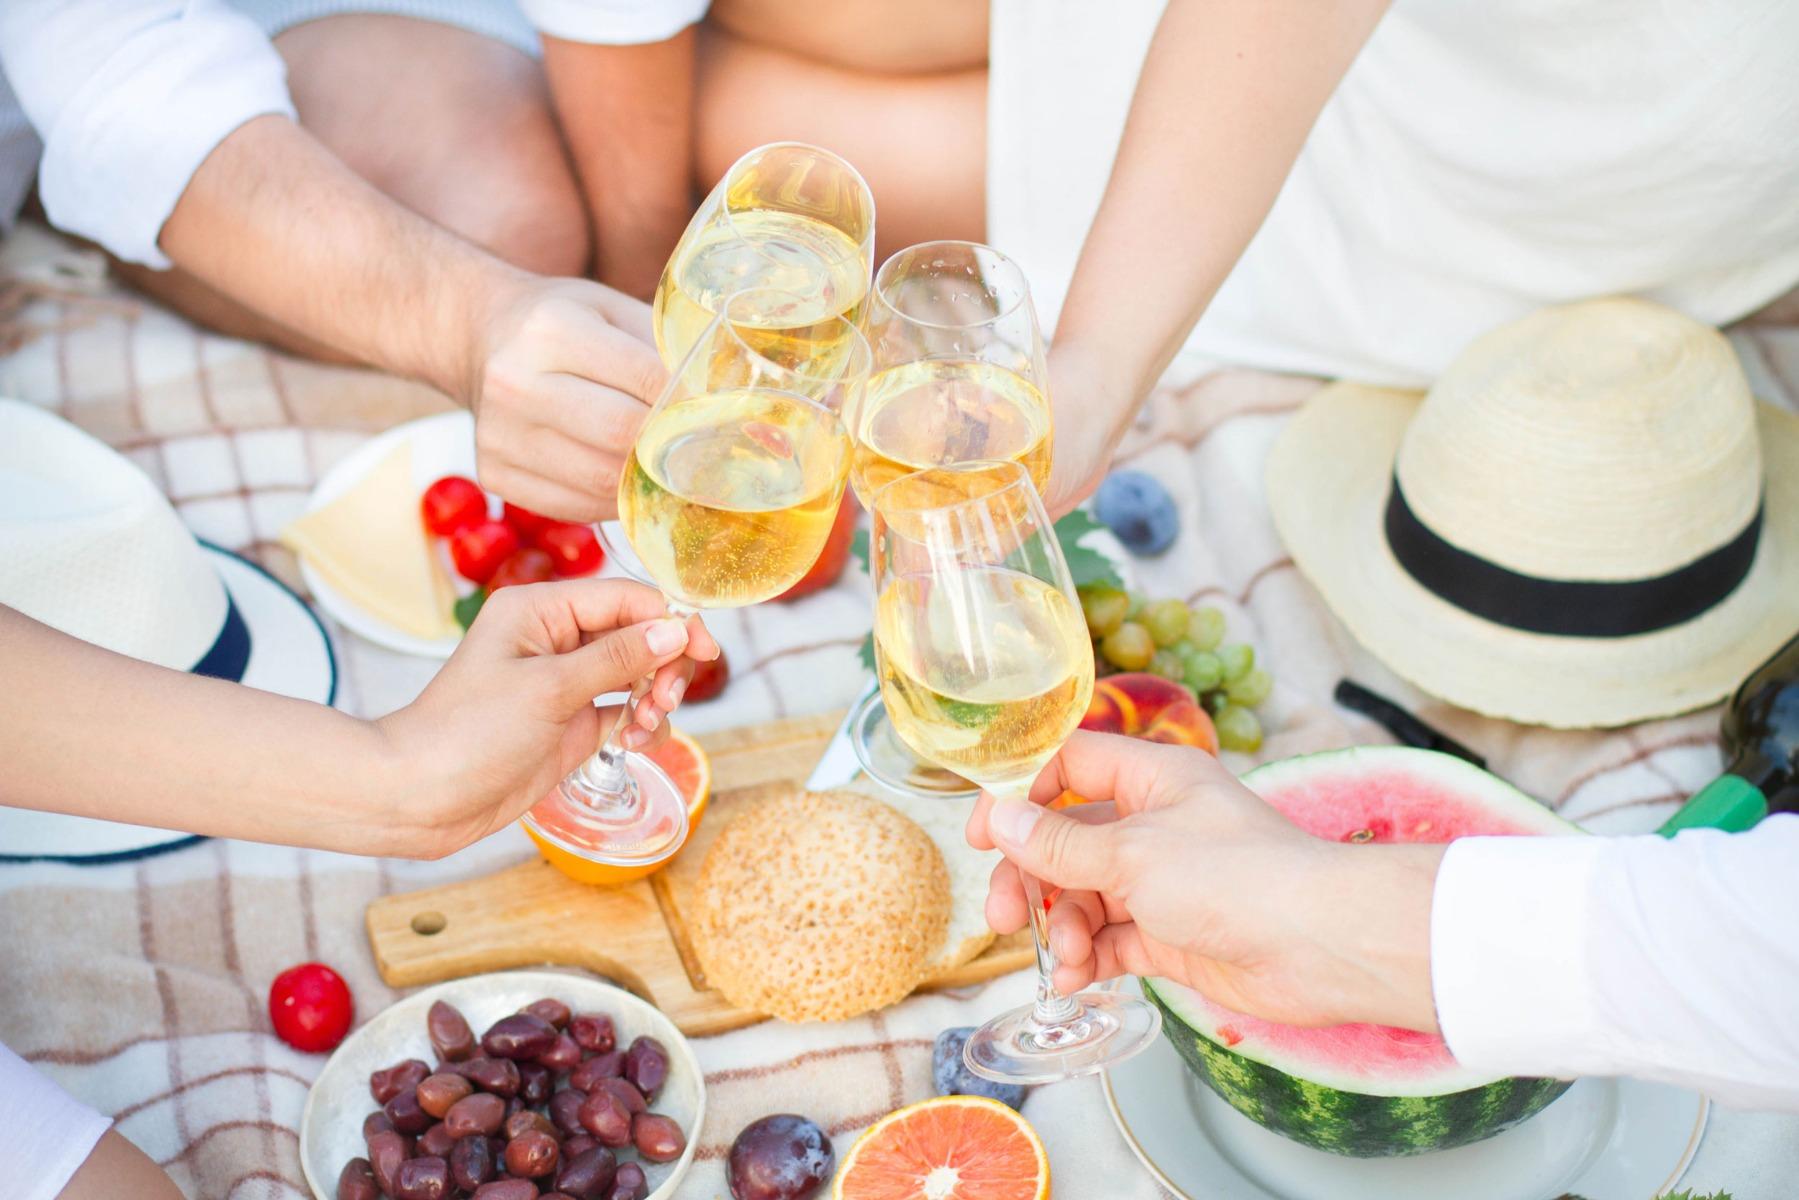 PrikenTik wijnstreken - Foodpairing - picknick